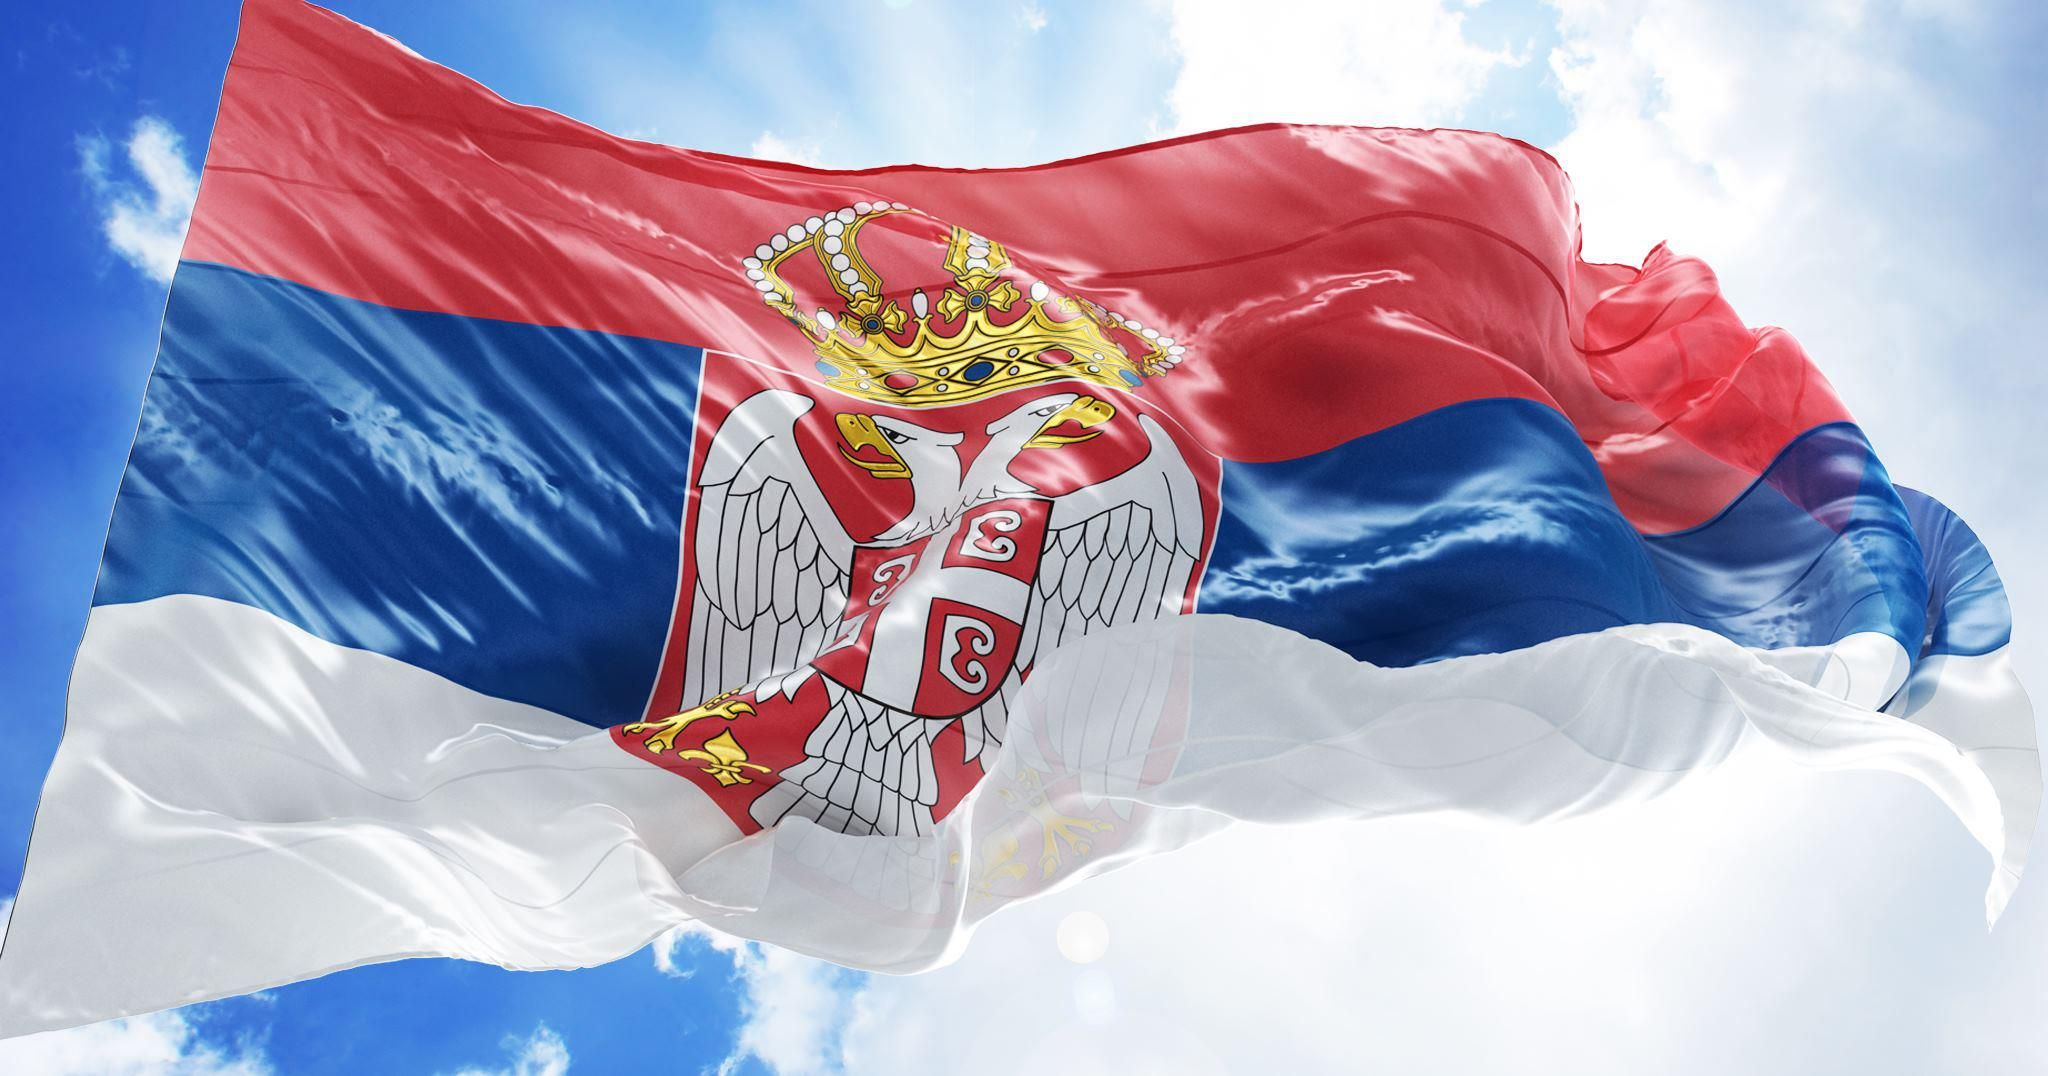 Dan državnosti Republike Srbije - Neradan dan